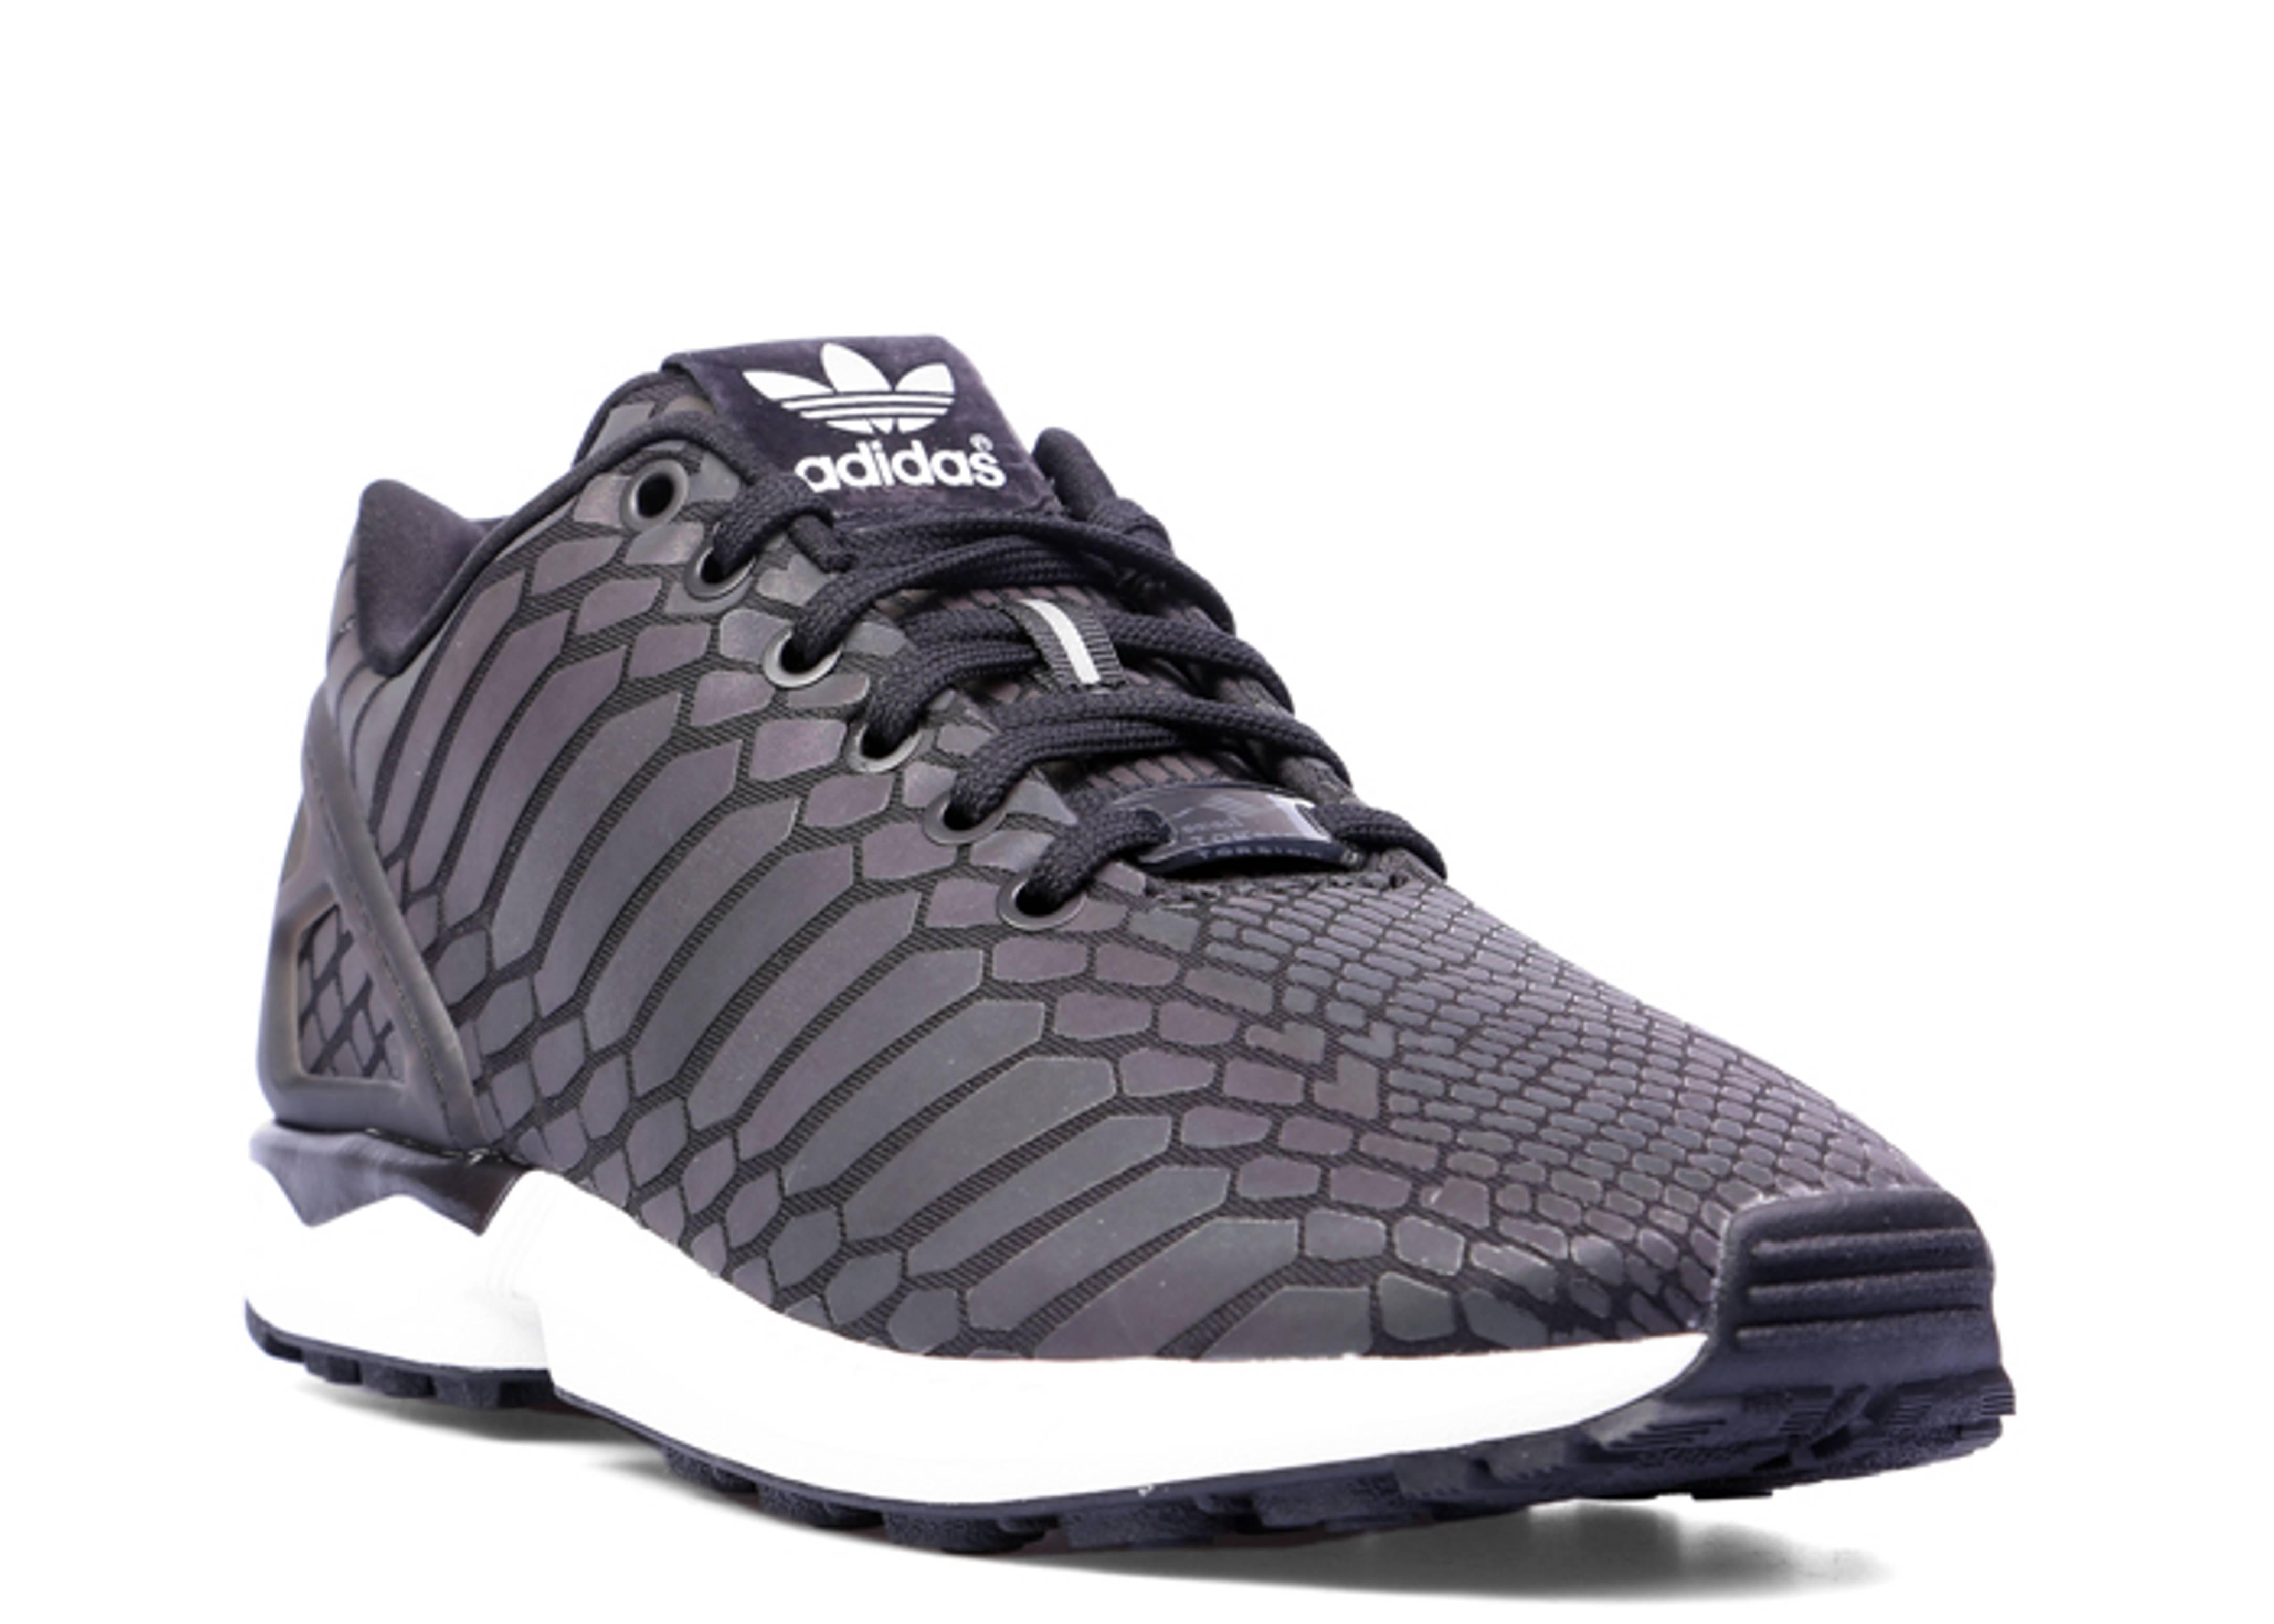 adidas zx flux 2015 zebrate